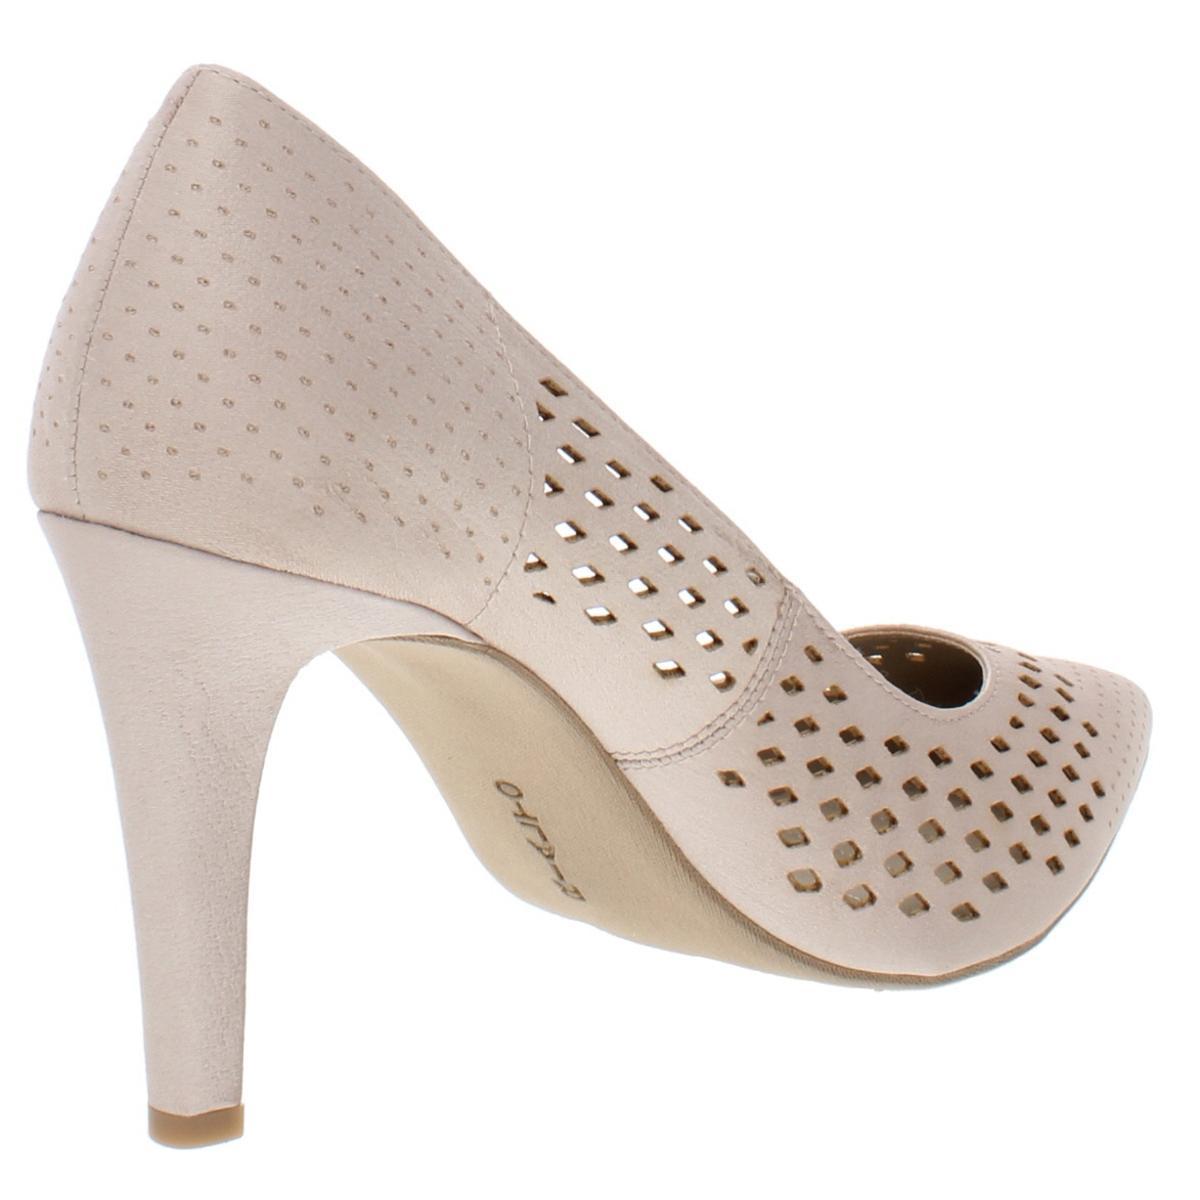 Rialto-Womens-Moreen-Patent-Pointed-Toe-Comfort-Fit-Dress-Pumps-Heels-BHFO-6456 thumbnail 6